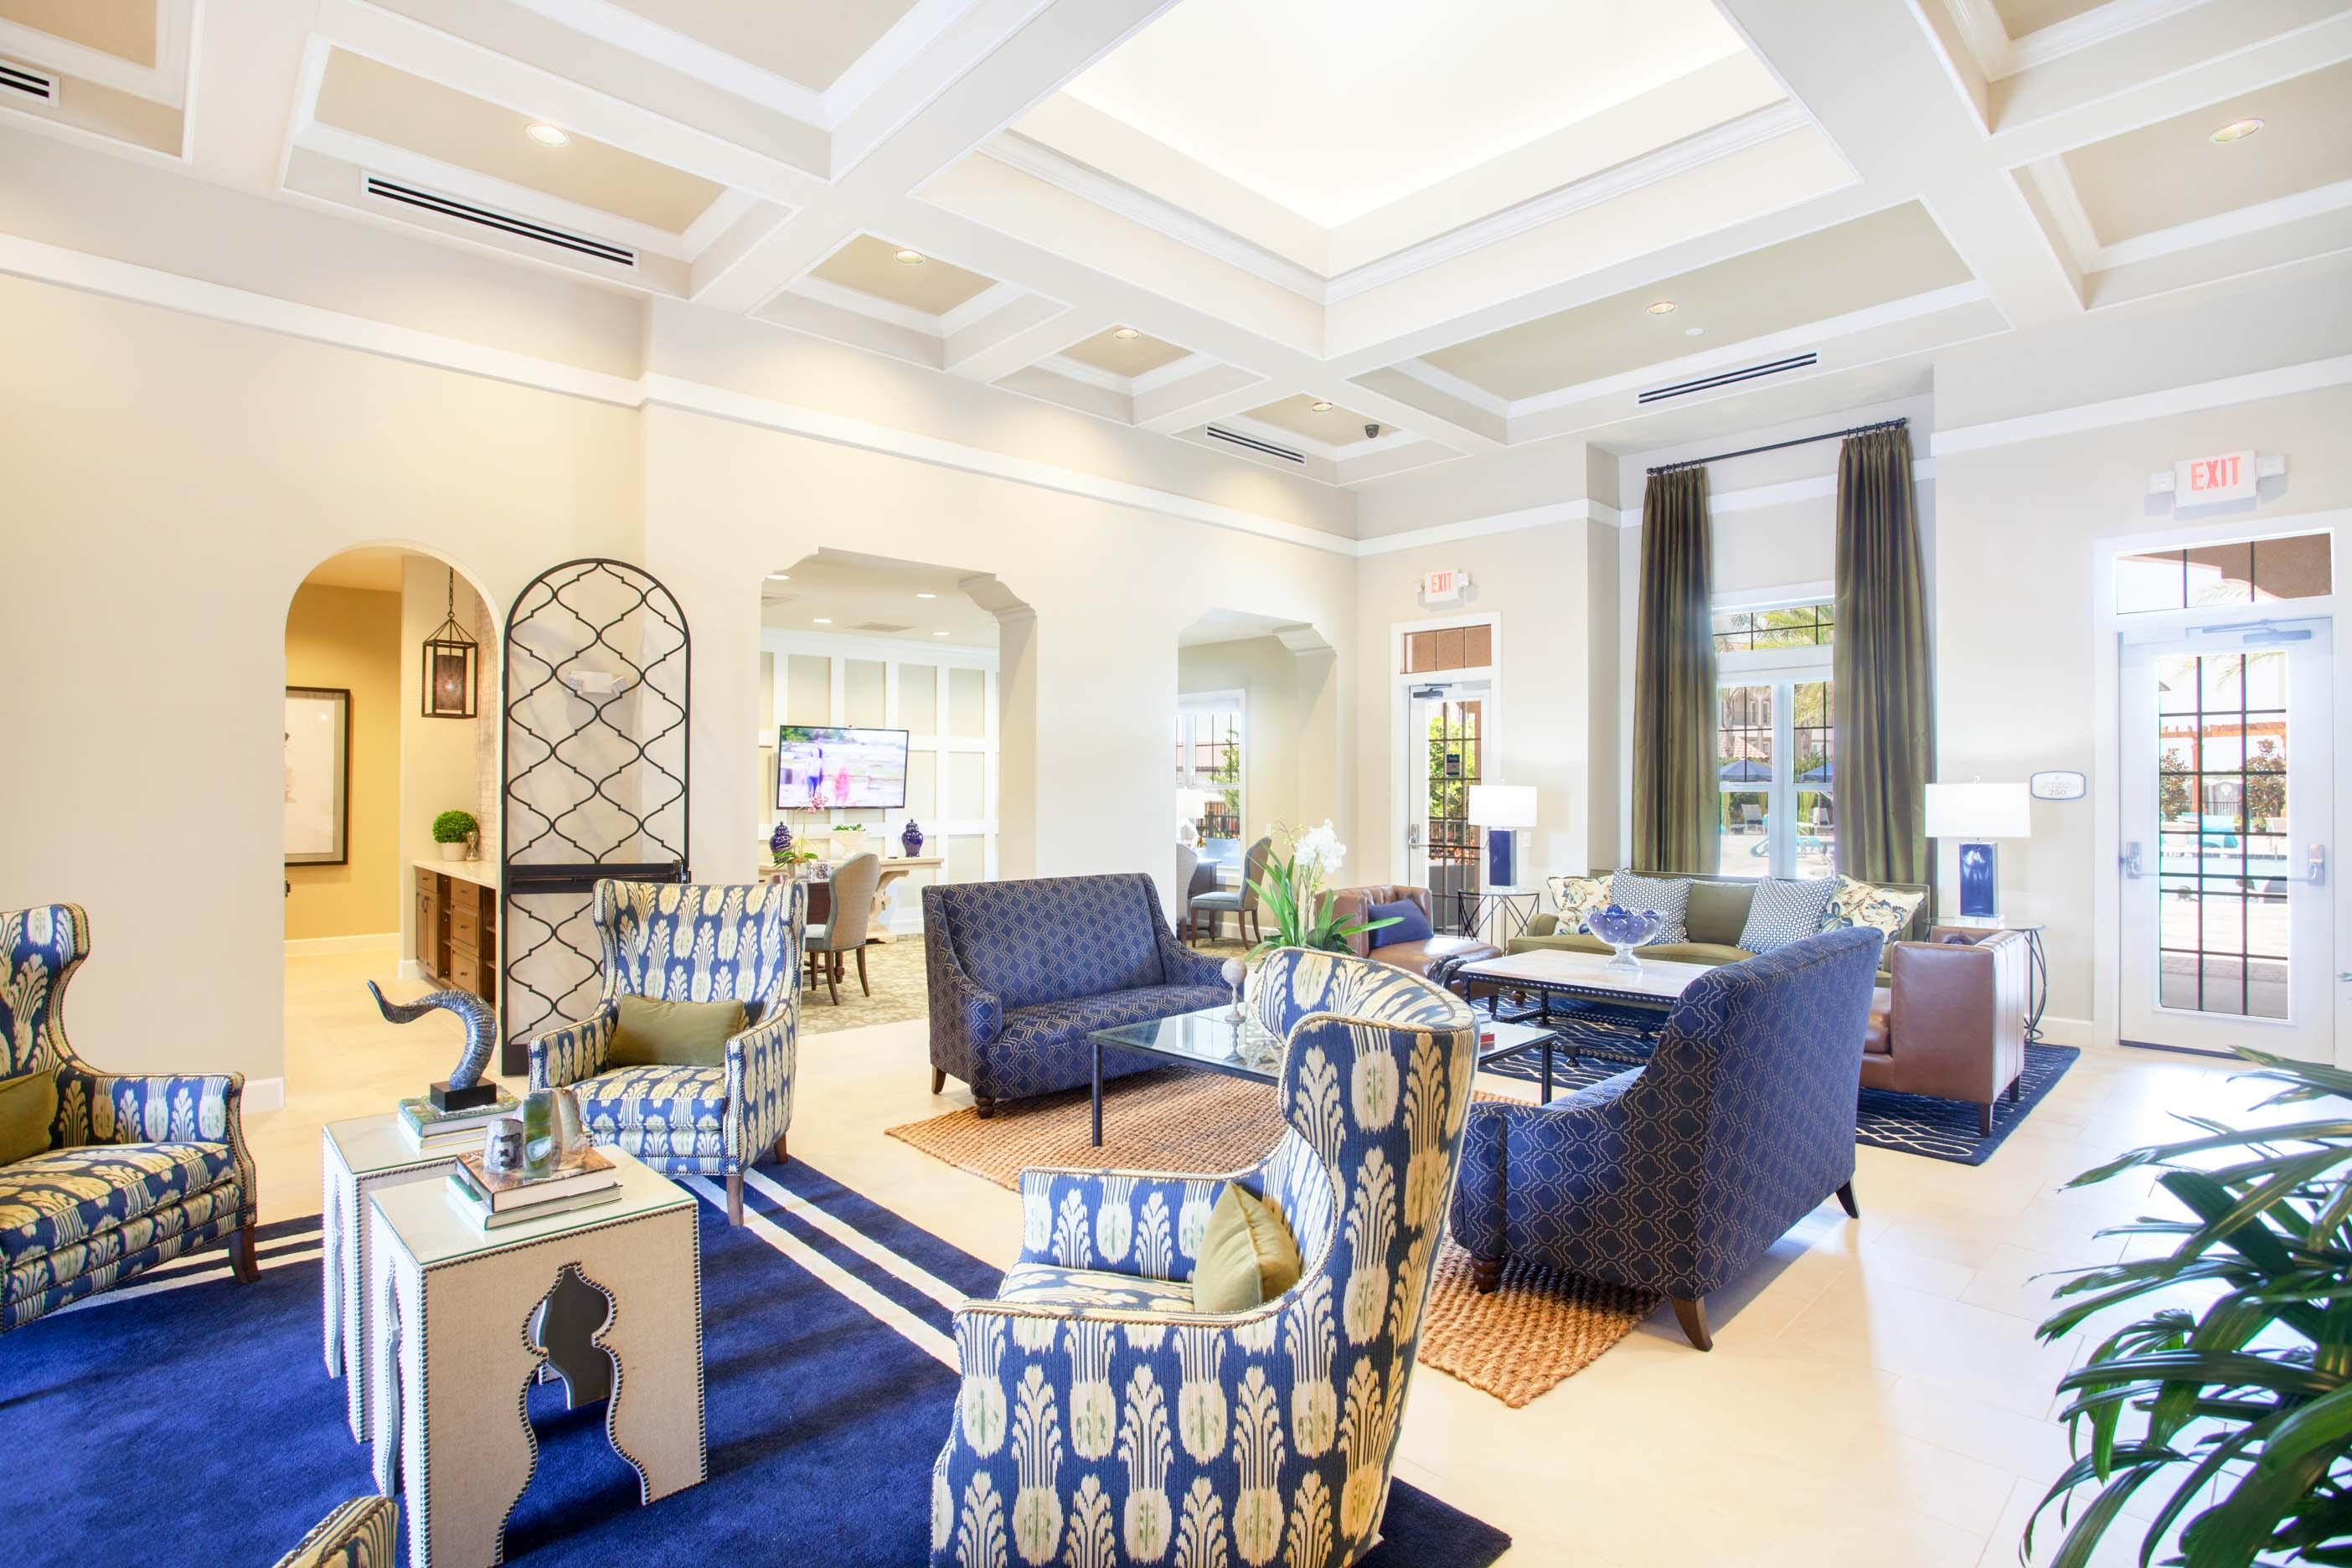 Multi-Family/Luxury Condos Archives | Wieland on luxury adult communities, luxury real estate, luxury neighborhoods, luxury offices, luxury restaurants, luxury high rise condos, luxury retail, luxury hotels, luxury fences,